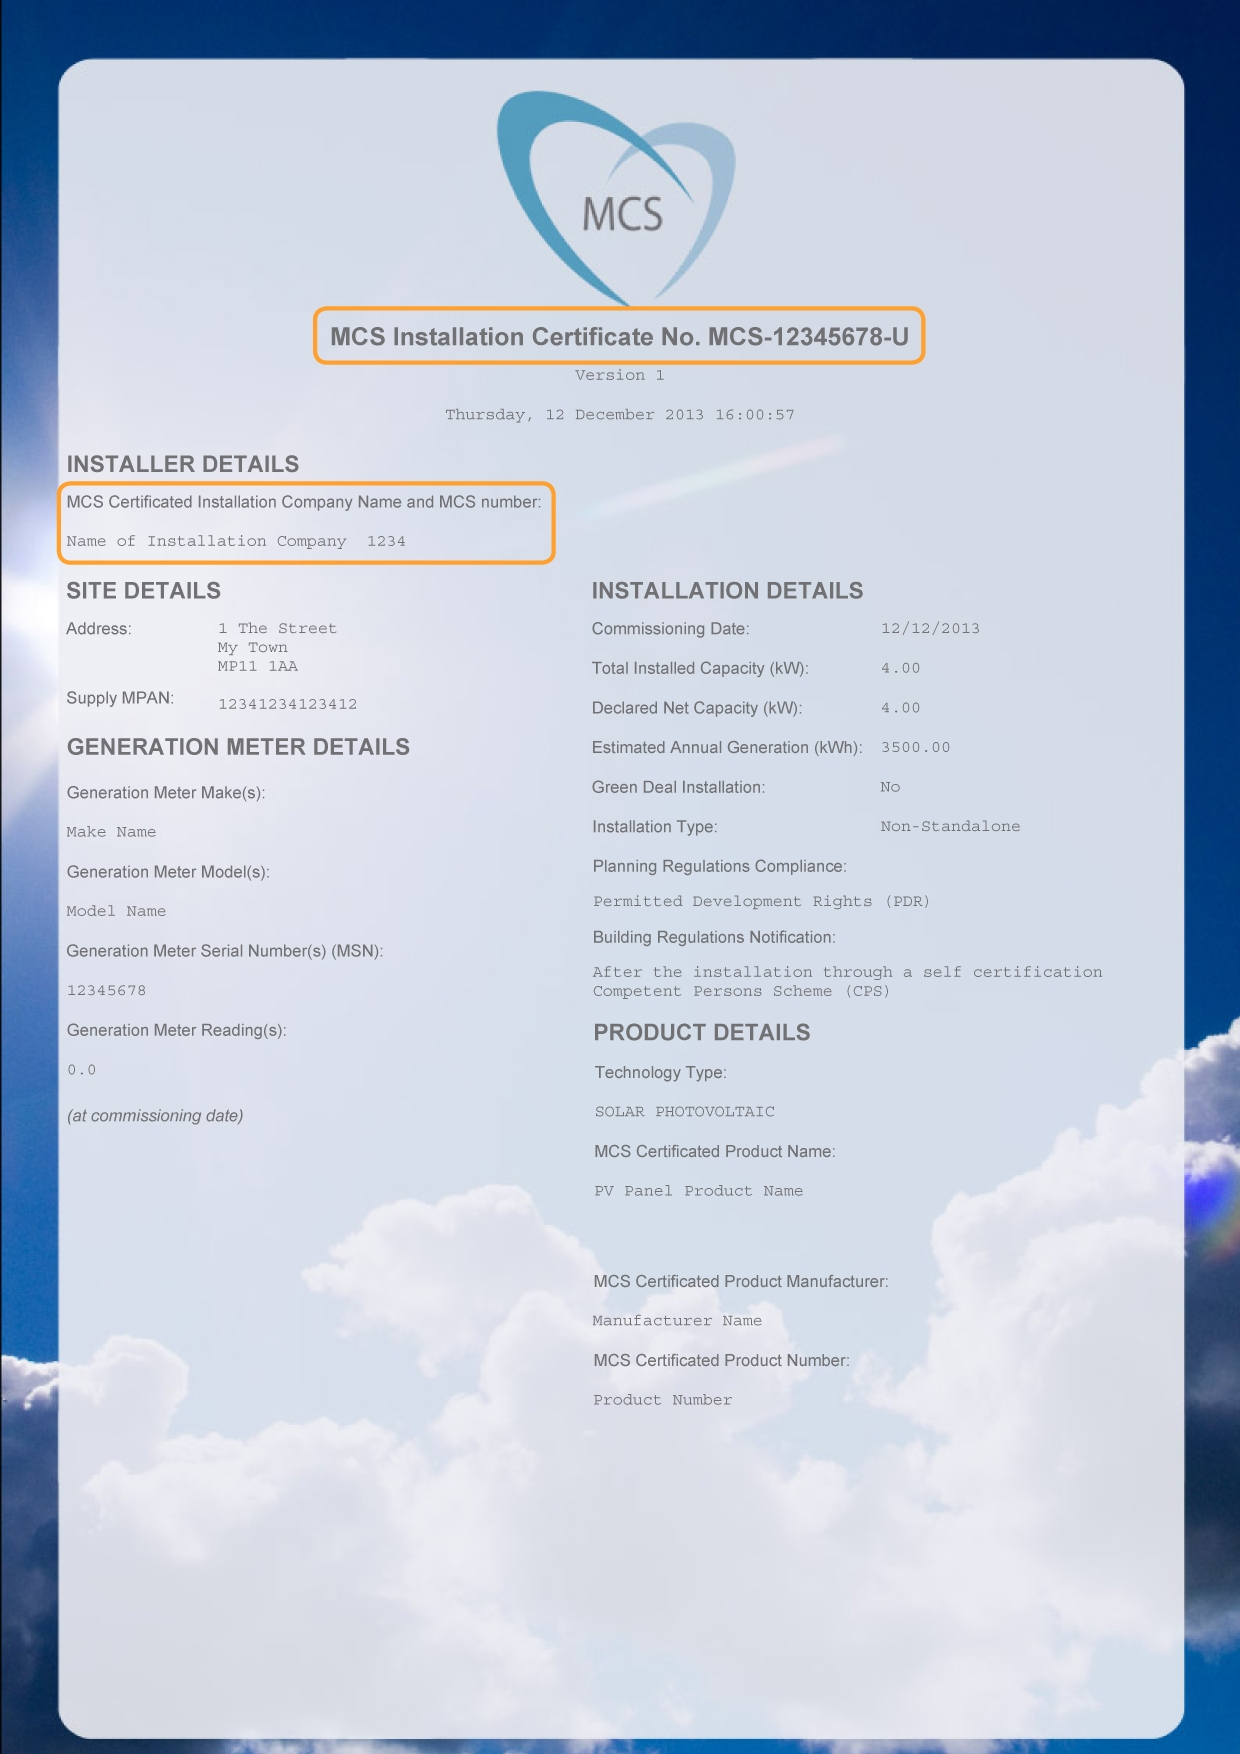 MCS installation certificate details